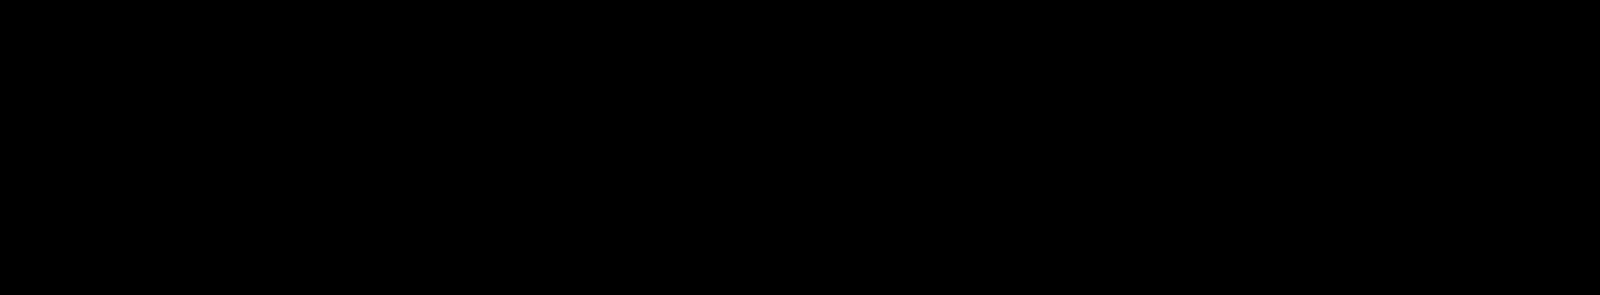 call of duty logo 2 - Call of Duty Logo